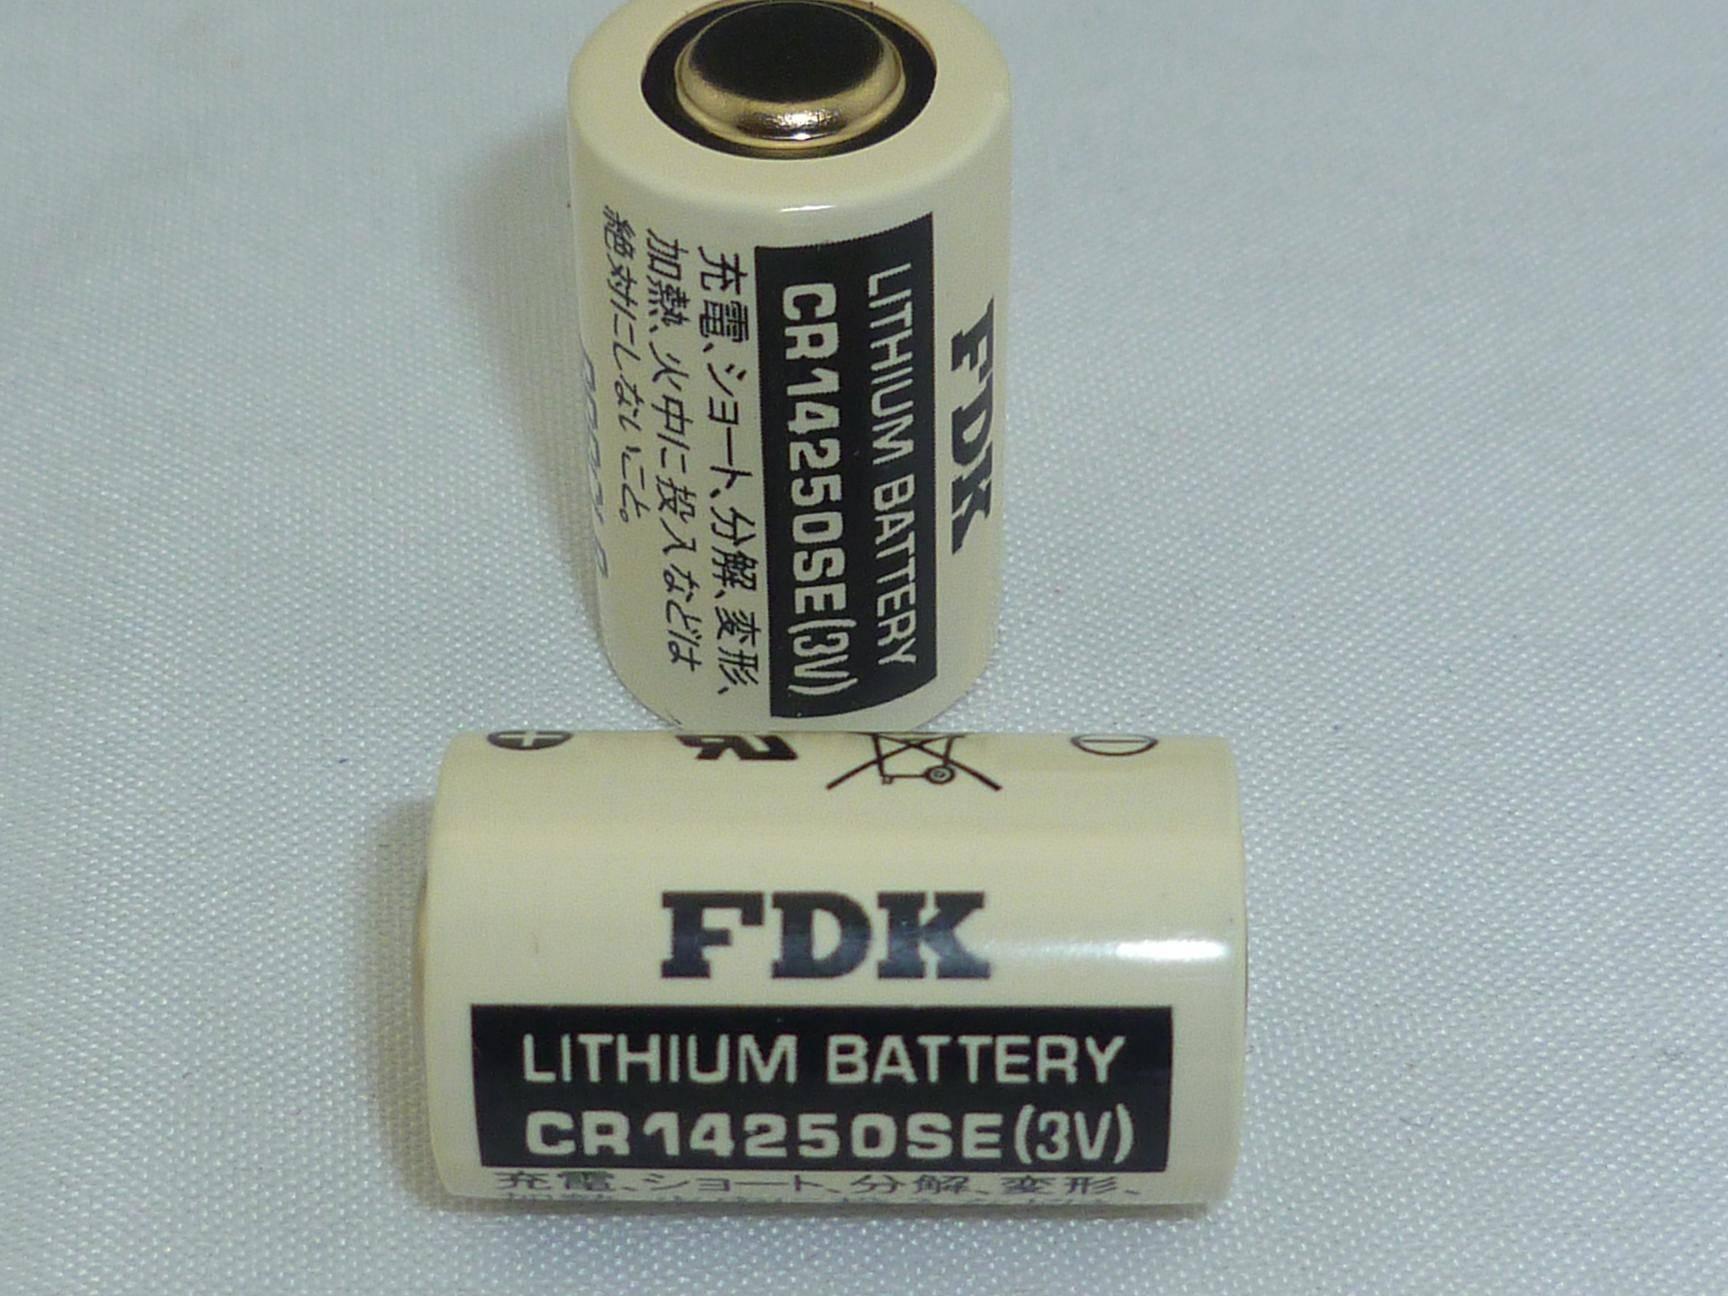 Lithium Battery CR14250SE(FDK)